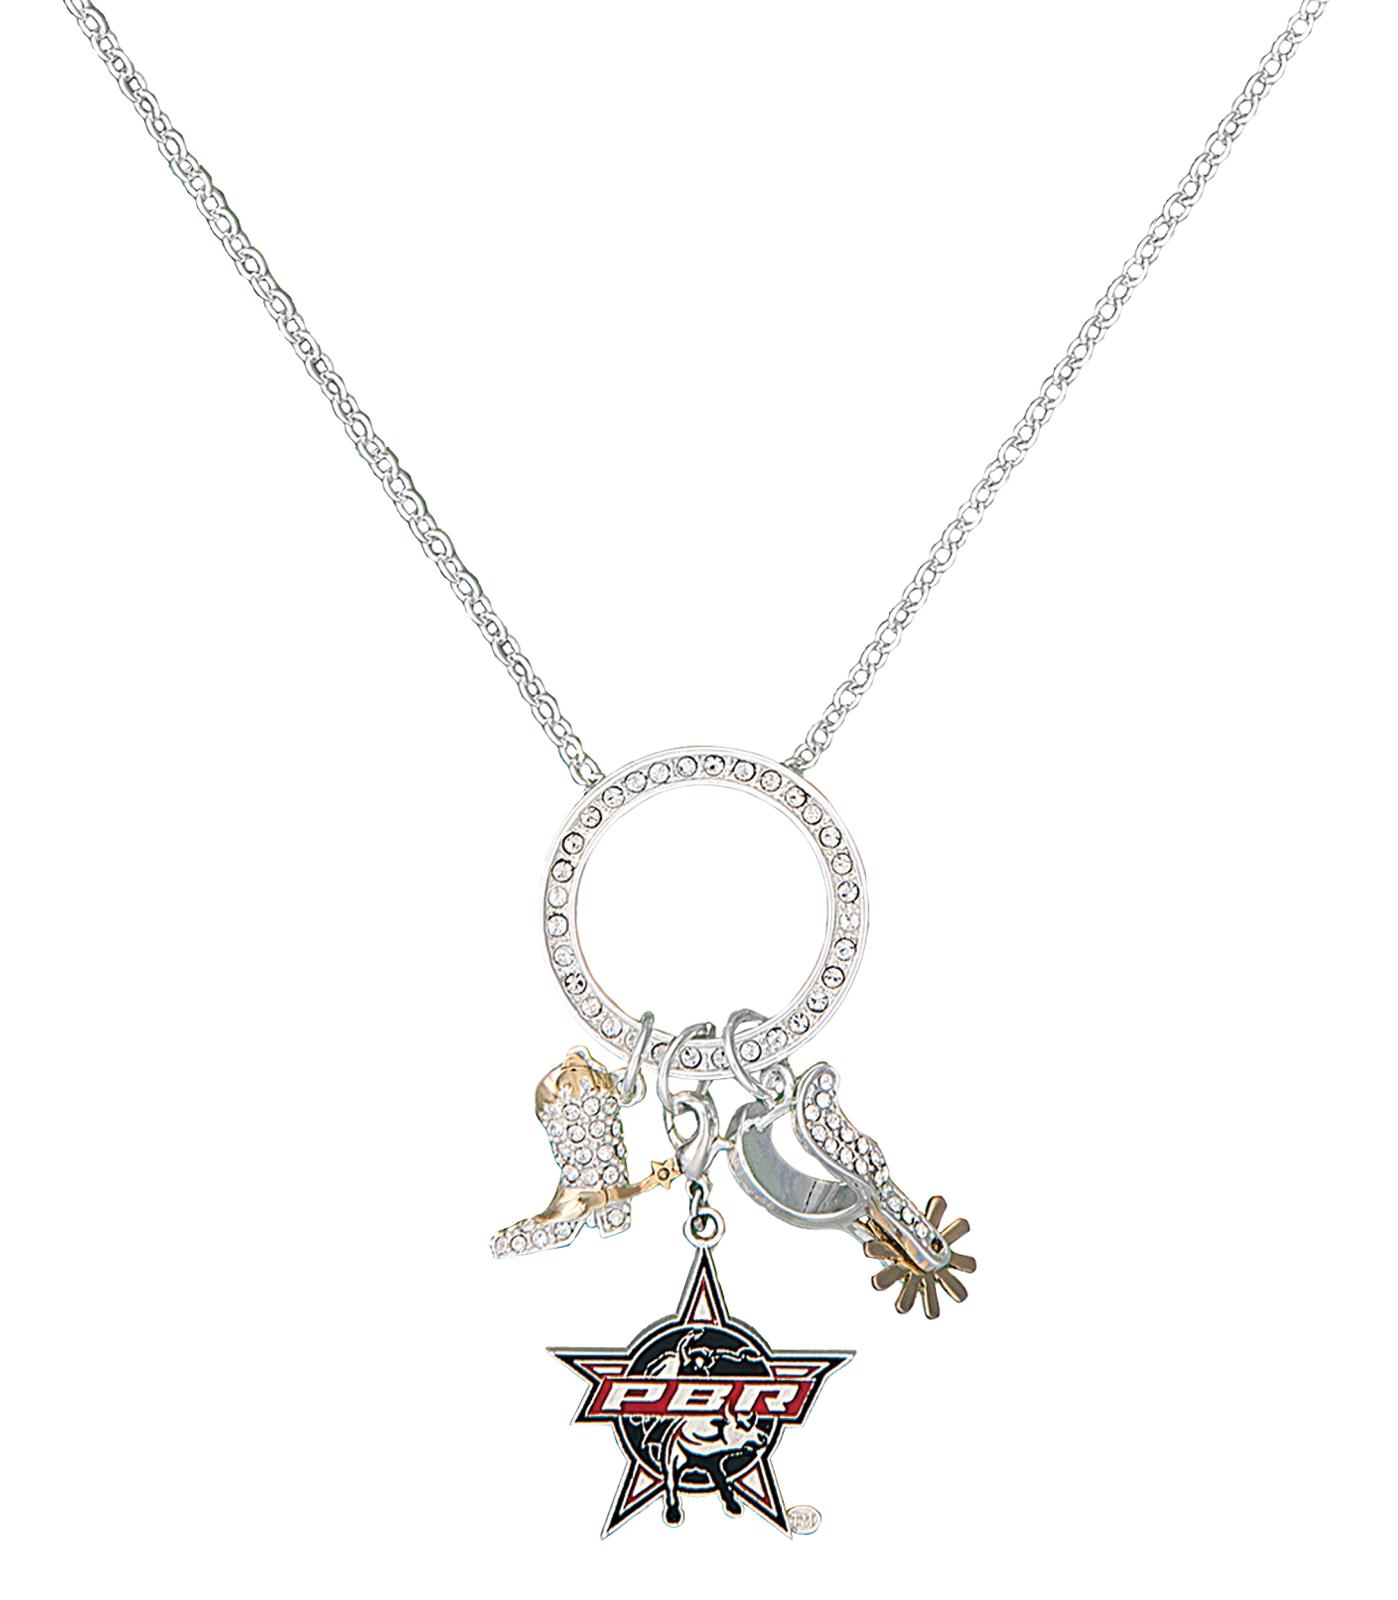 Montana Silversmiths PBR Circle Charm Necklace